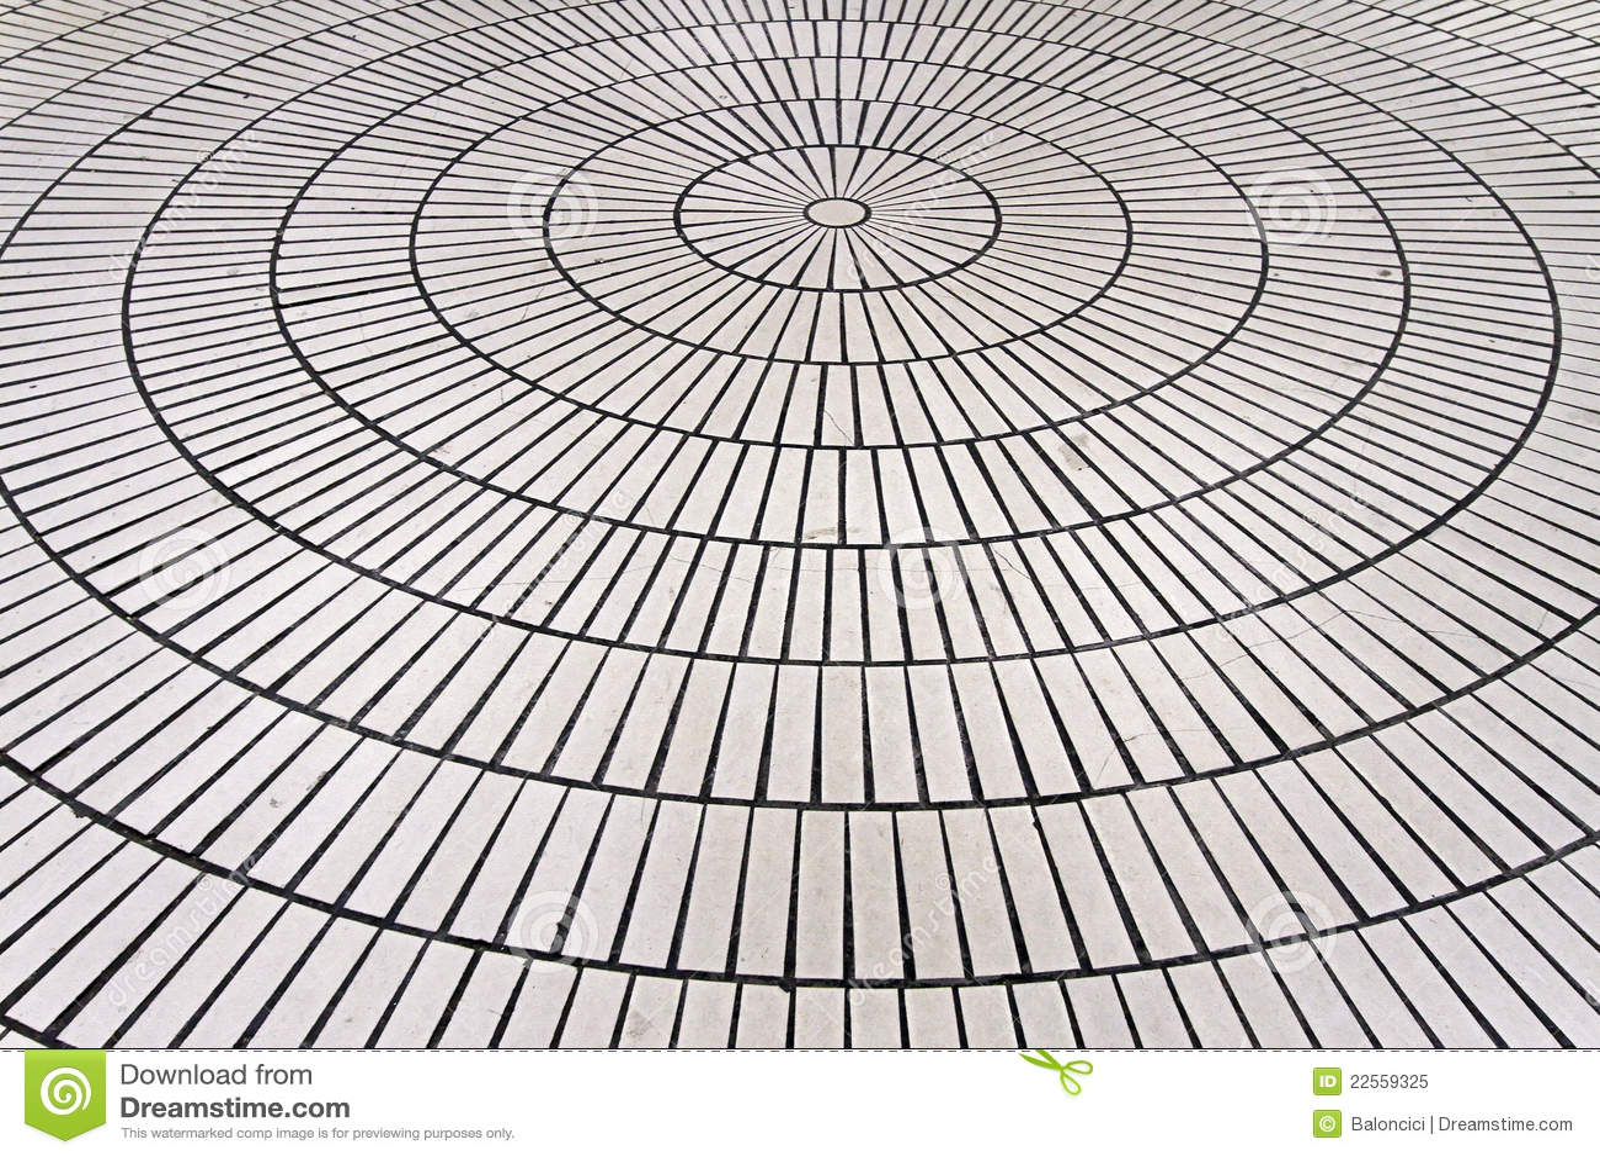 Circle Tiles Circle Tiles Royalty Free Stock Photo Image 22559325